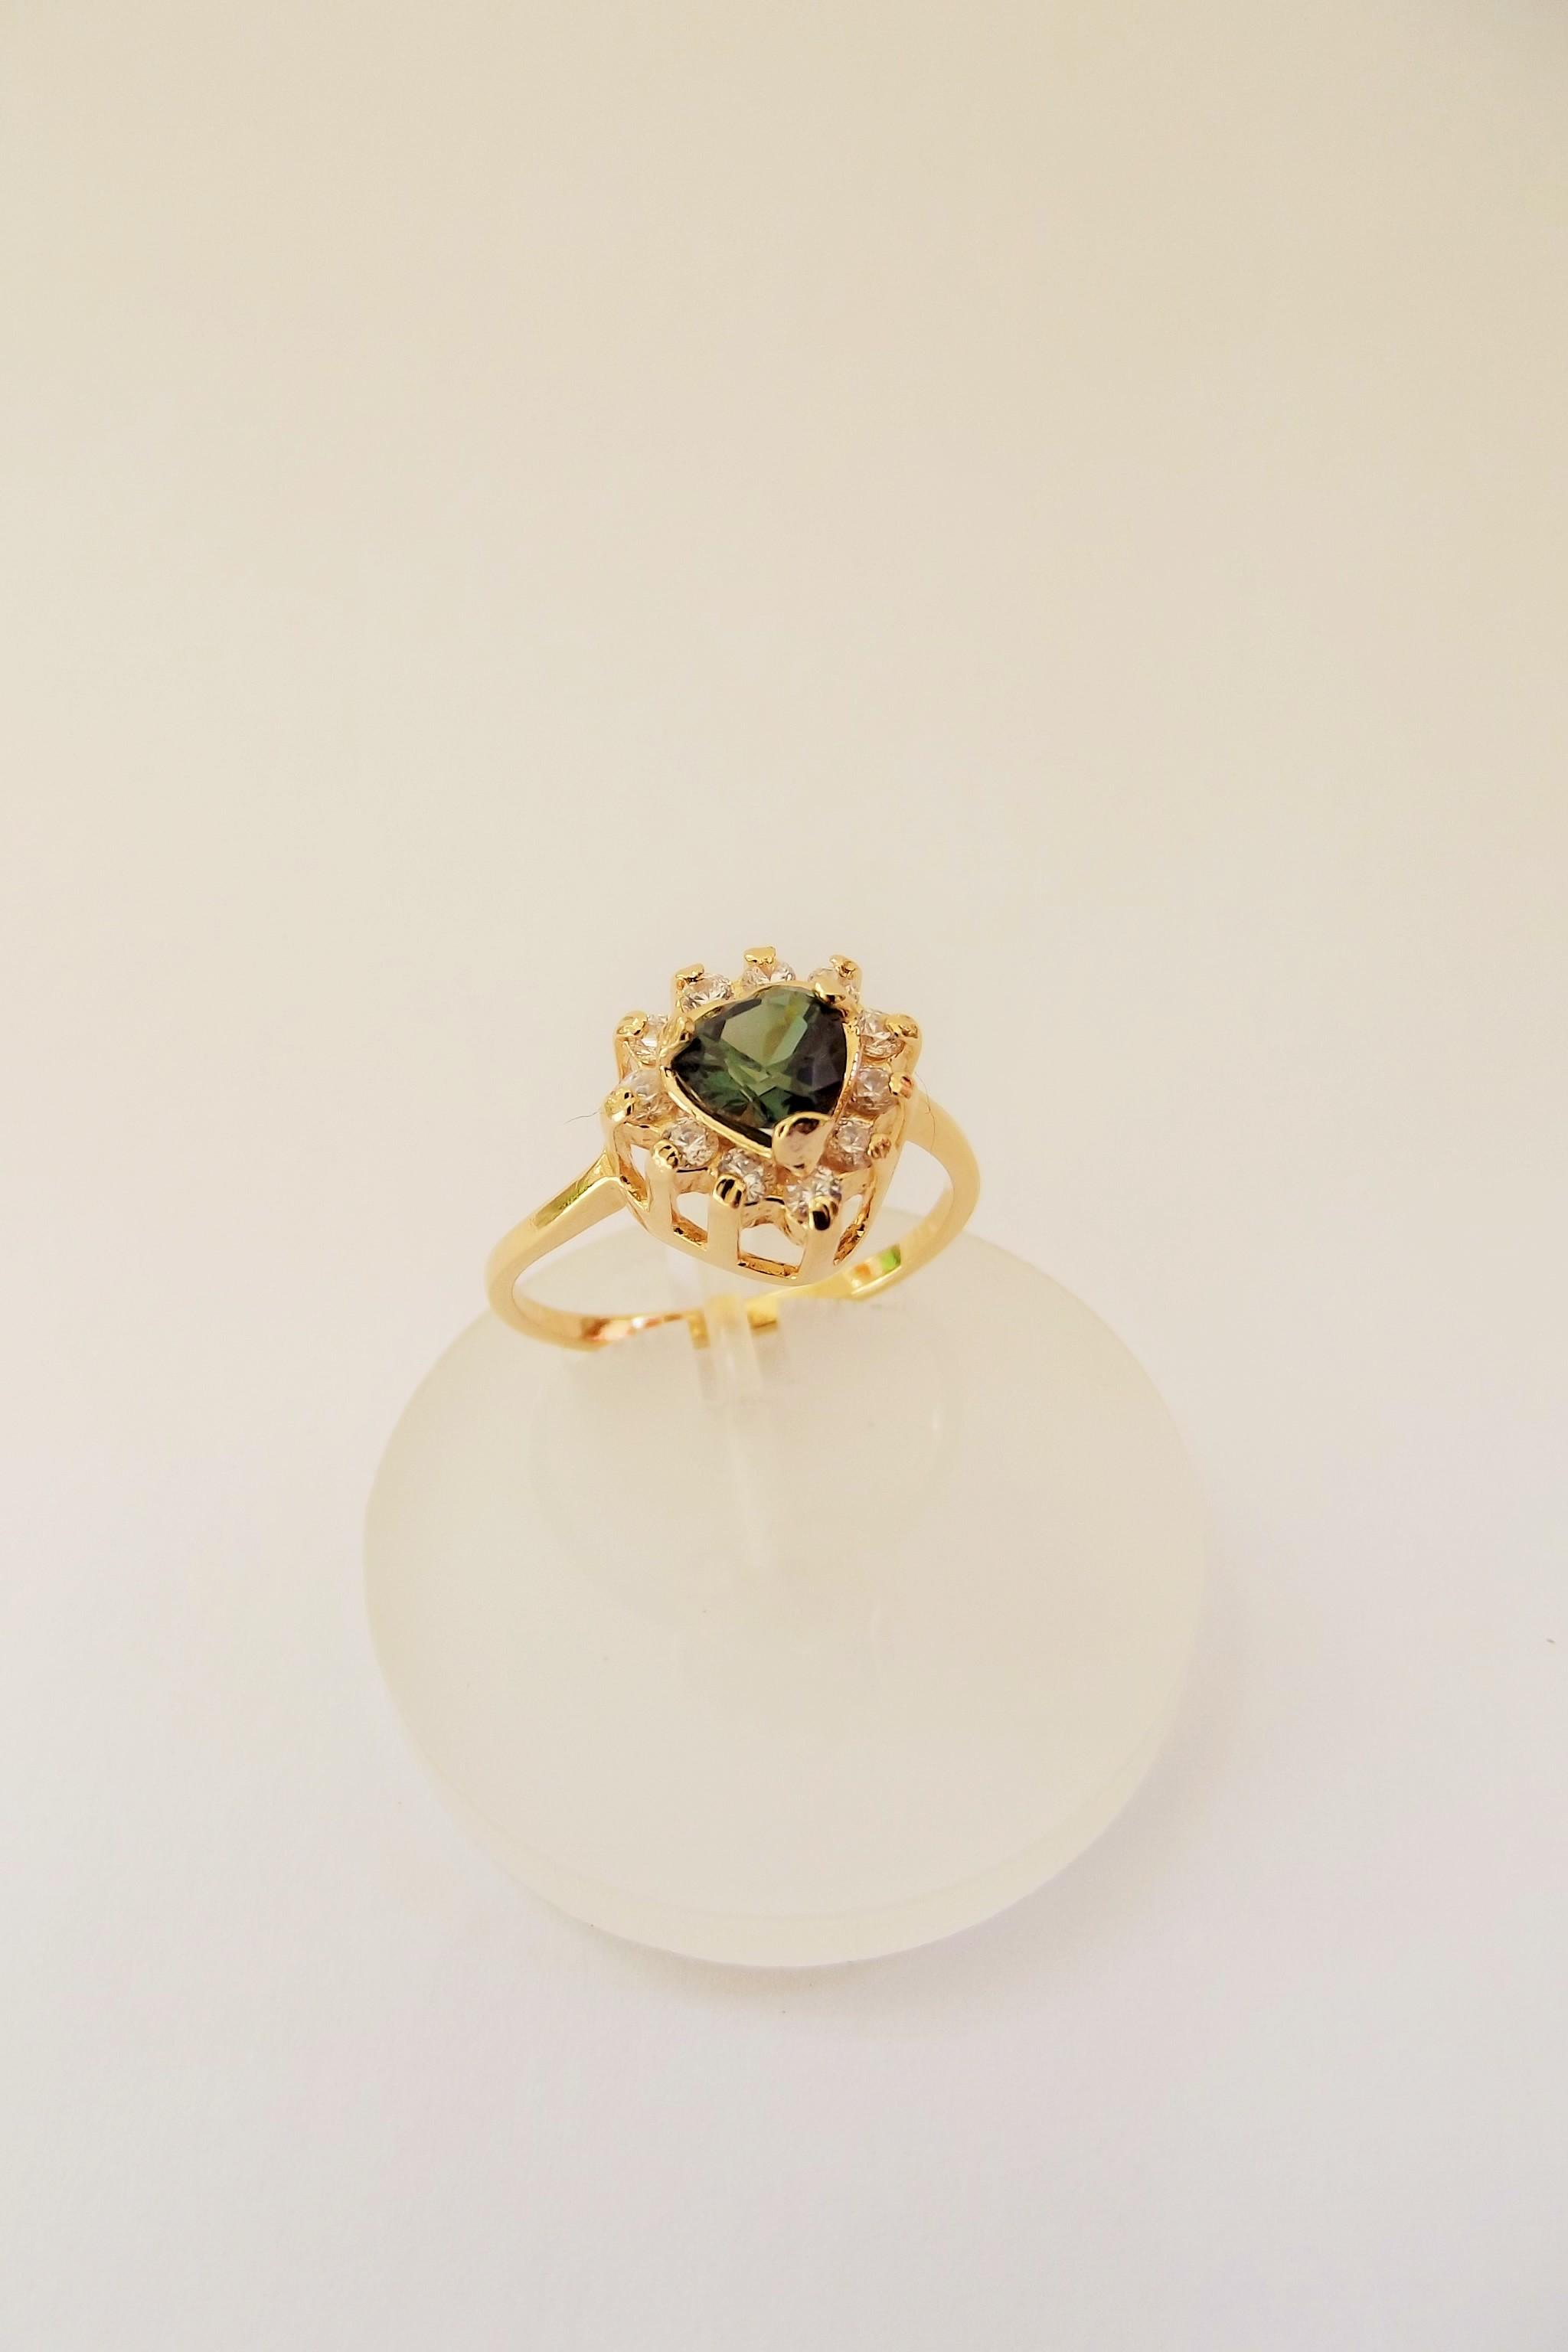 Anel Chuveiro Pedra Rosa Safira com Zirconias Brancas   Elo7 e351ee1ba3